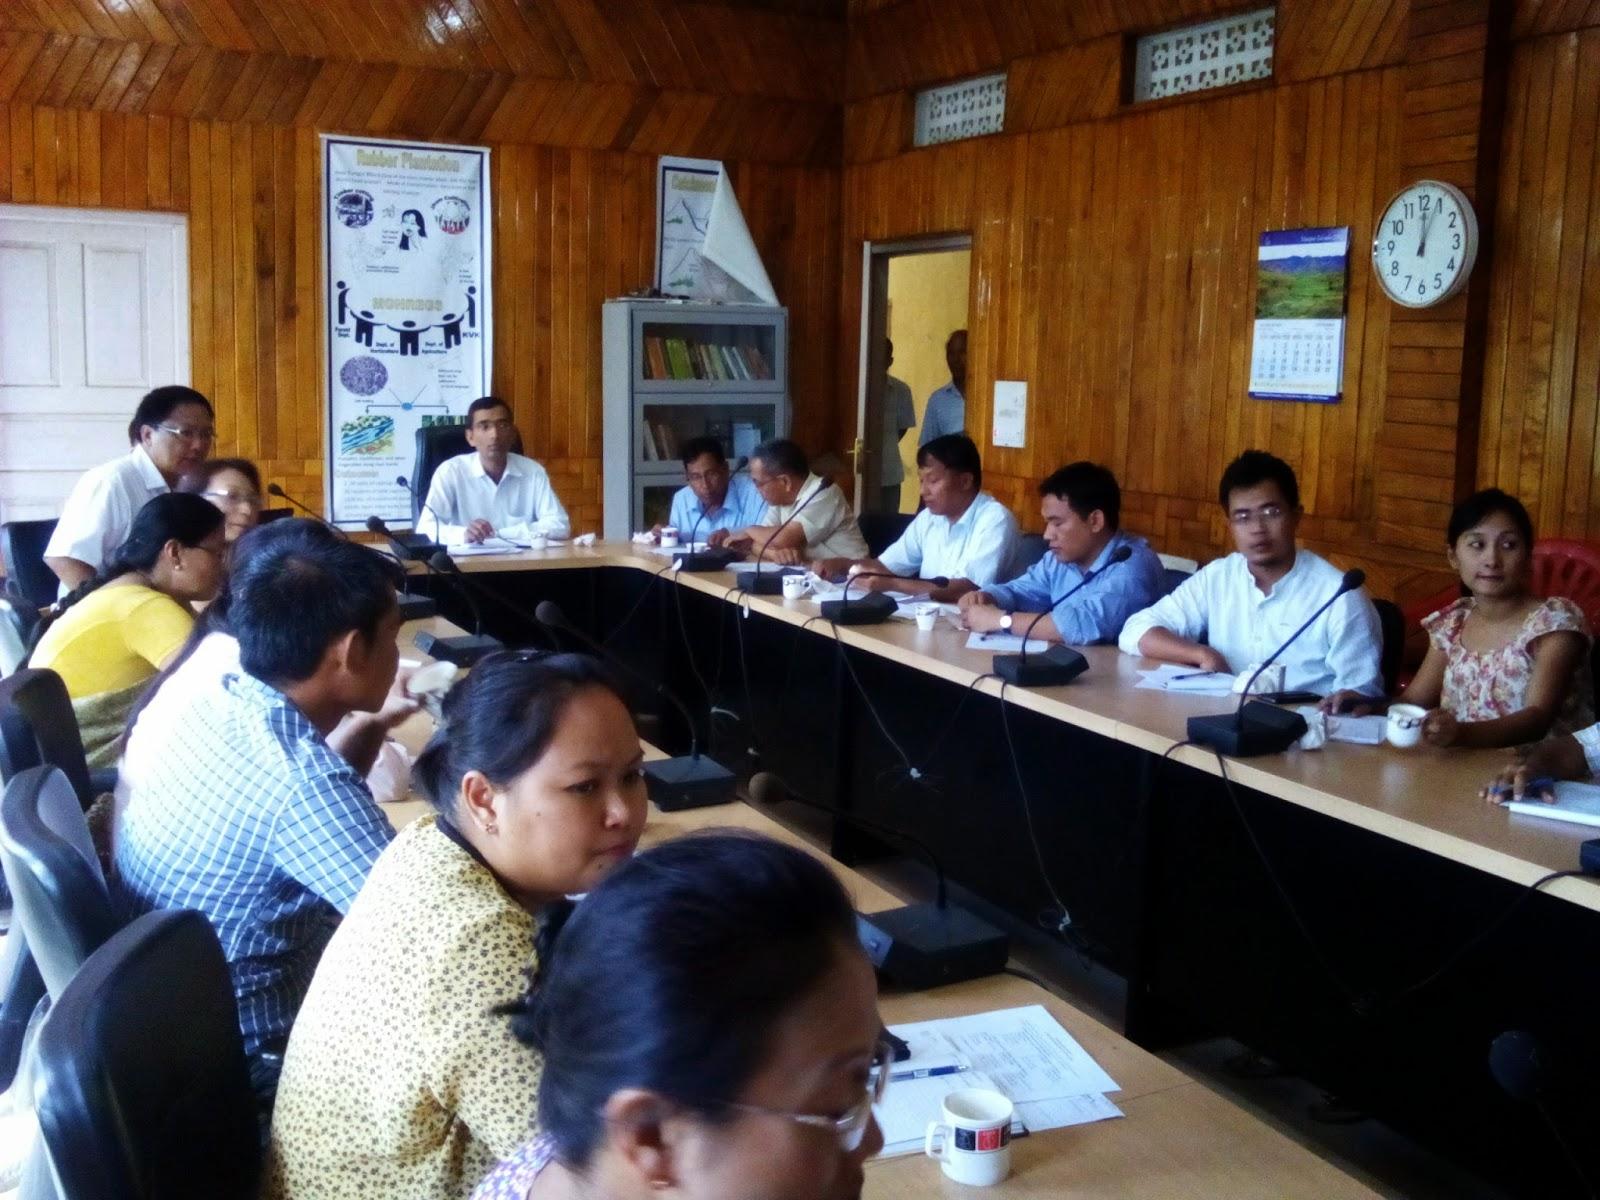 Manipur Express | September 3, 2014